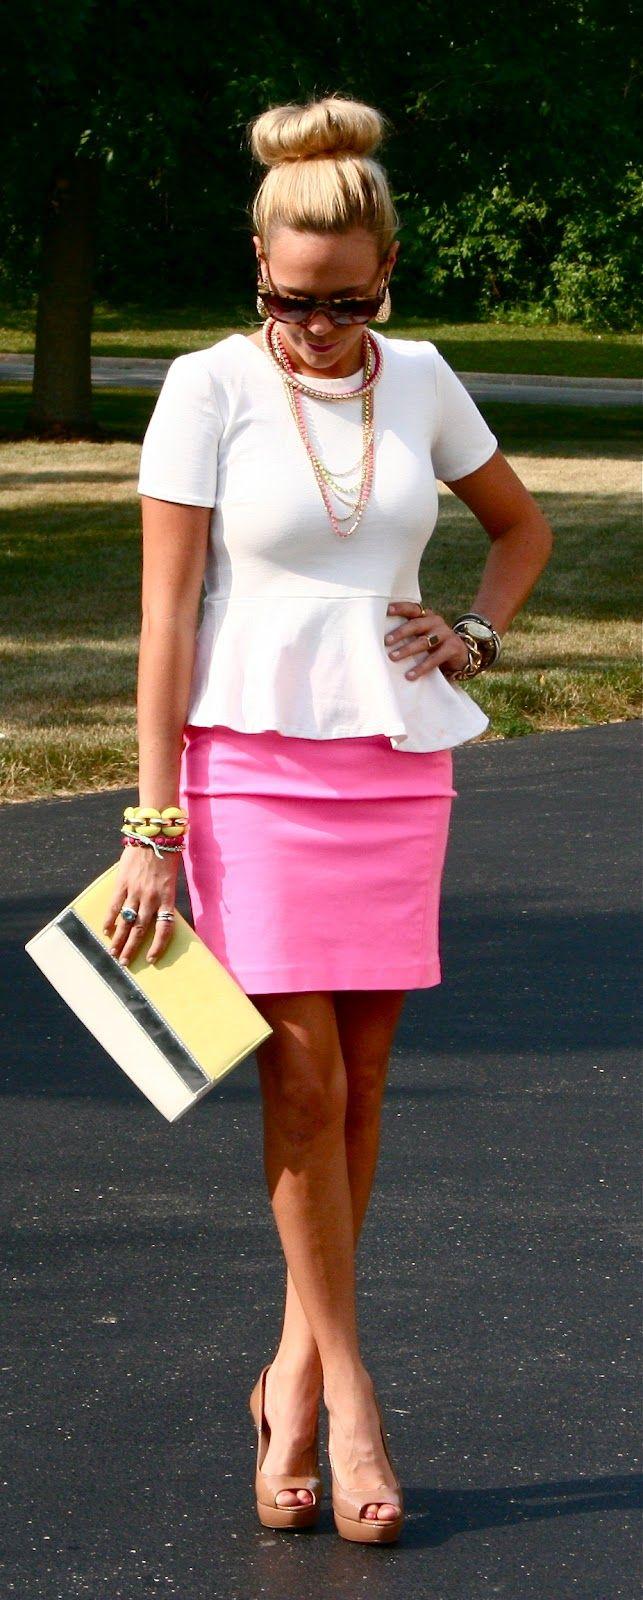 4cce088040a White peplum, pink skirt, cognac open toe heels | Fashion Drools ...